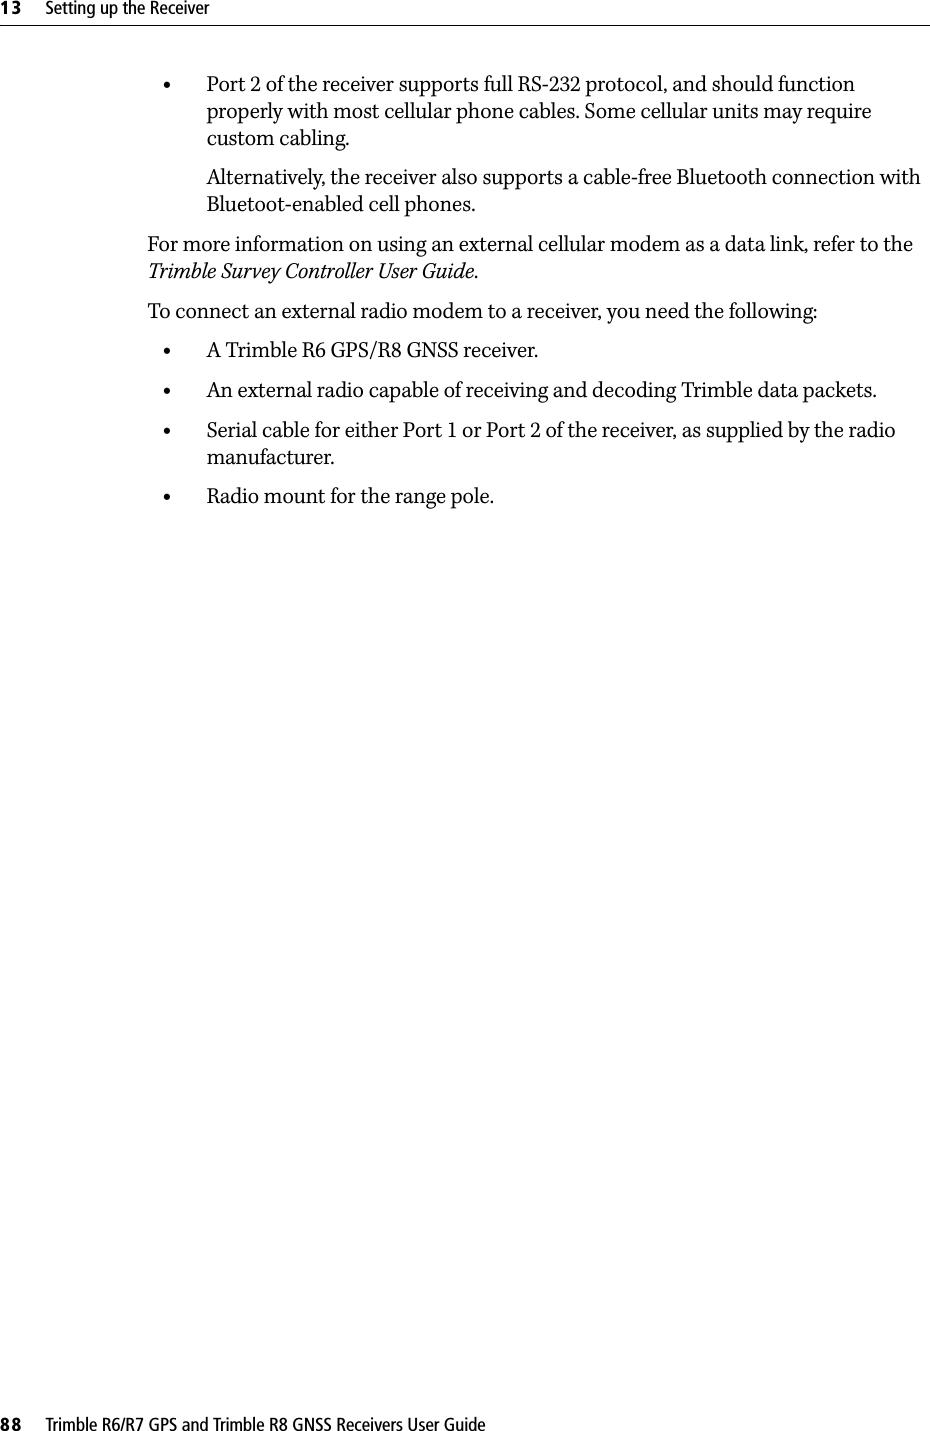 Trimble 5940071-B1 R8 GNSS Receiver User Manual manual